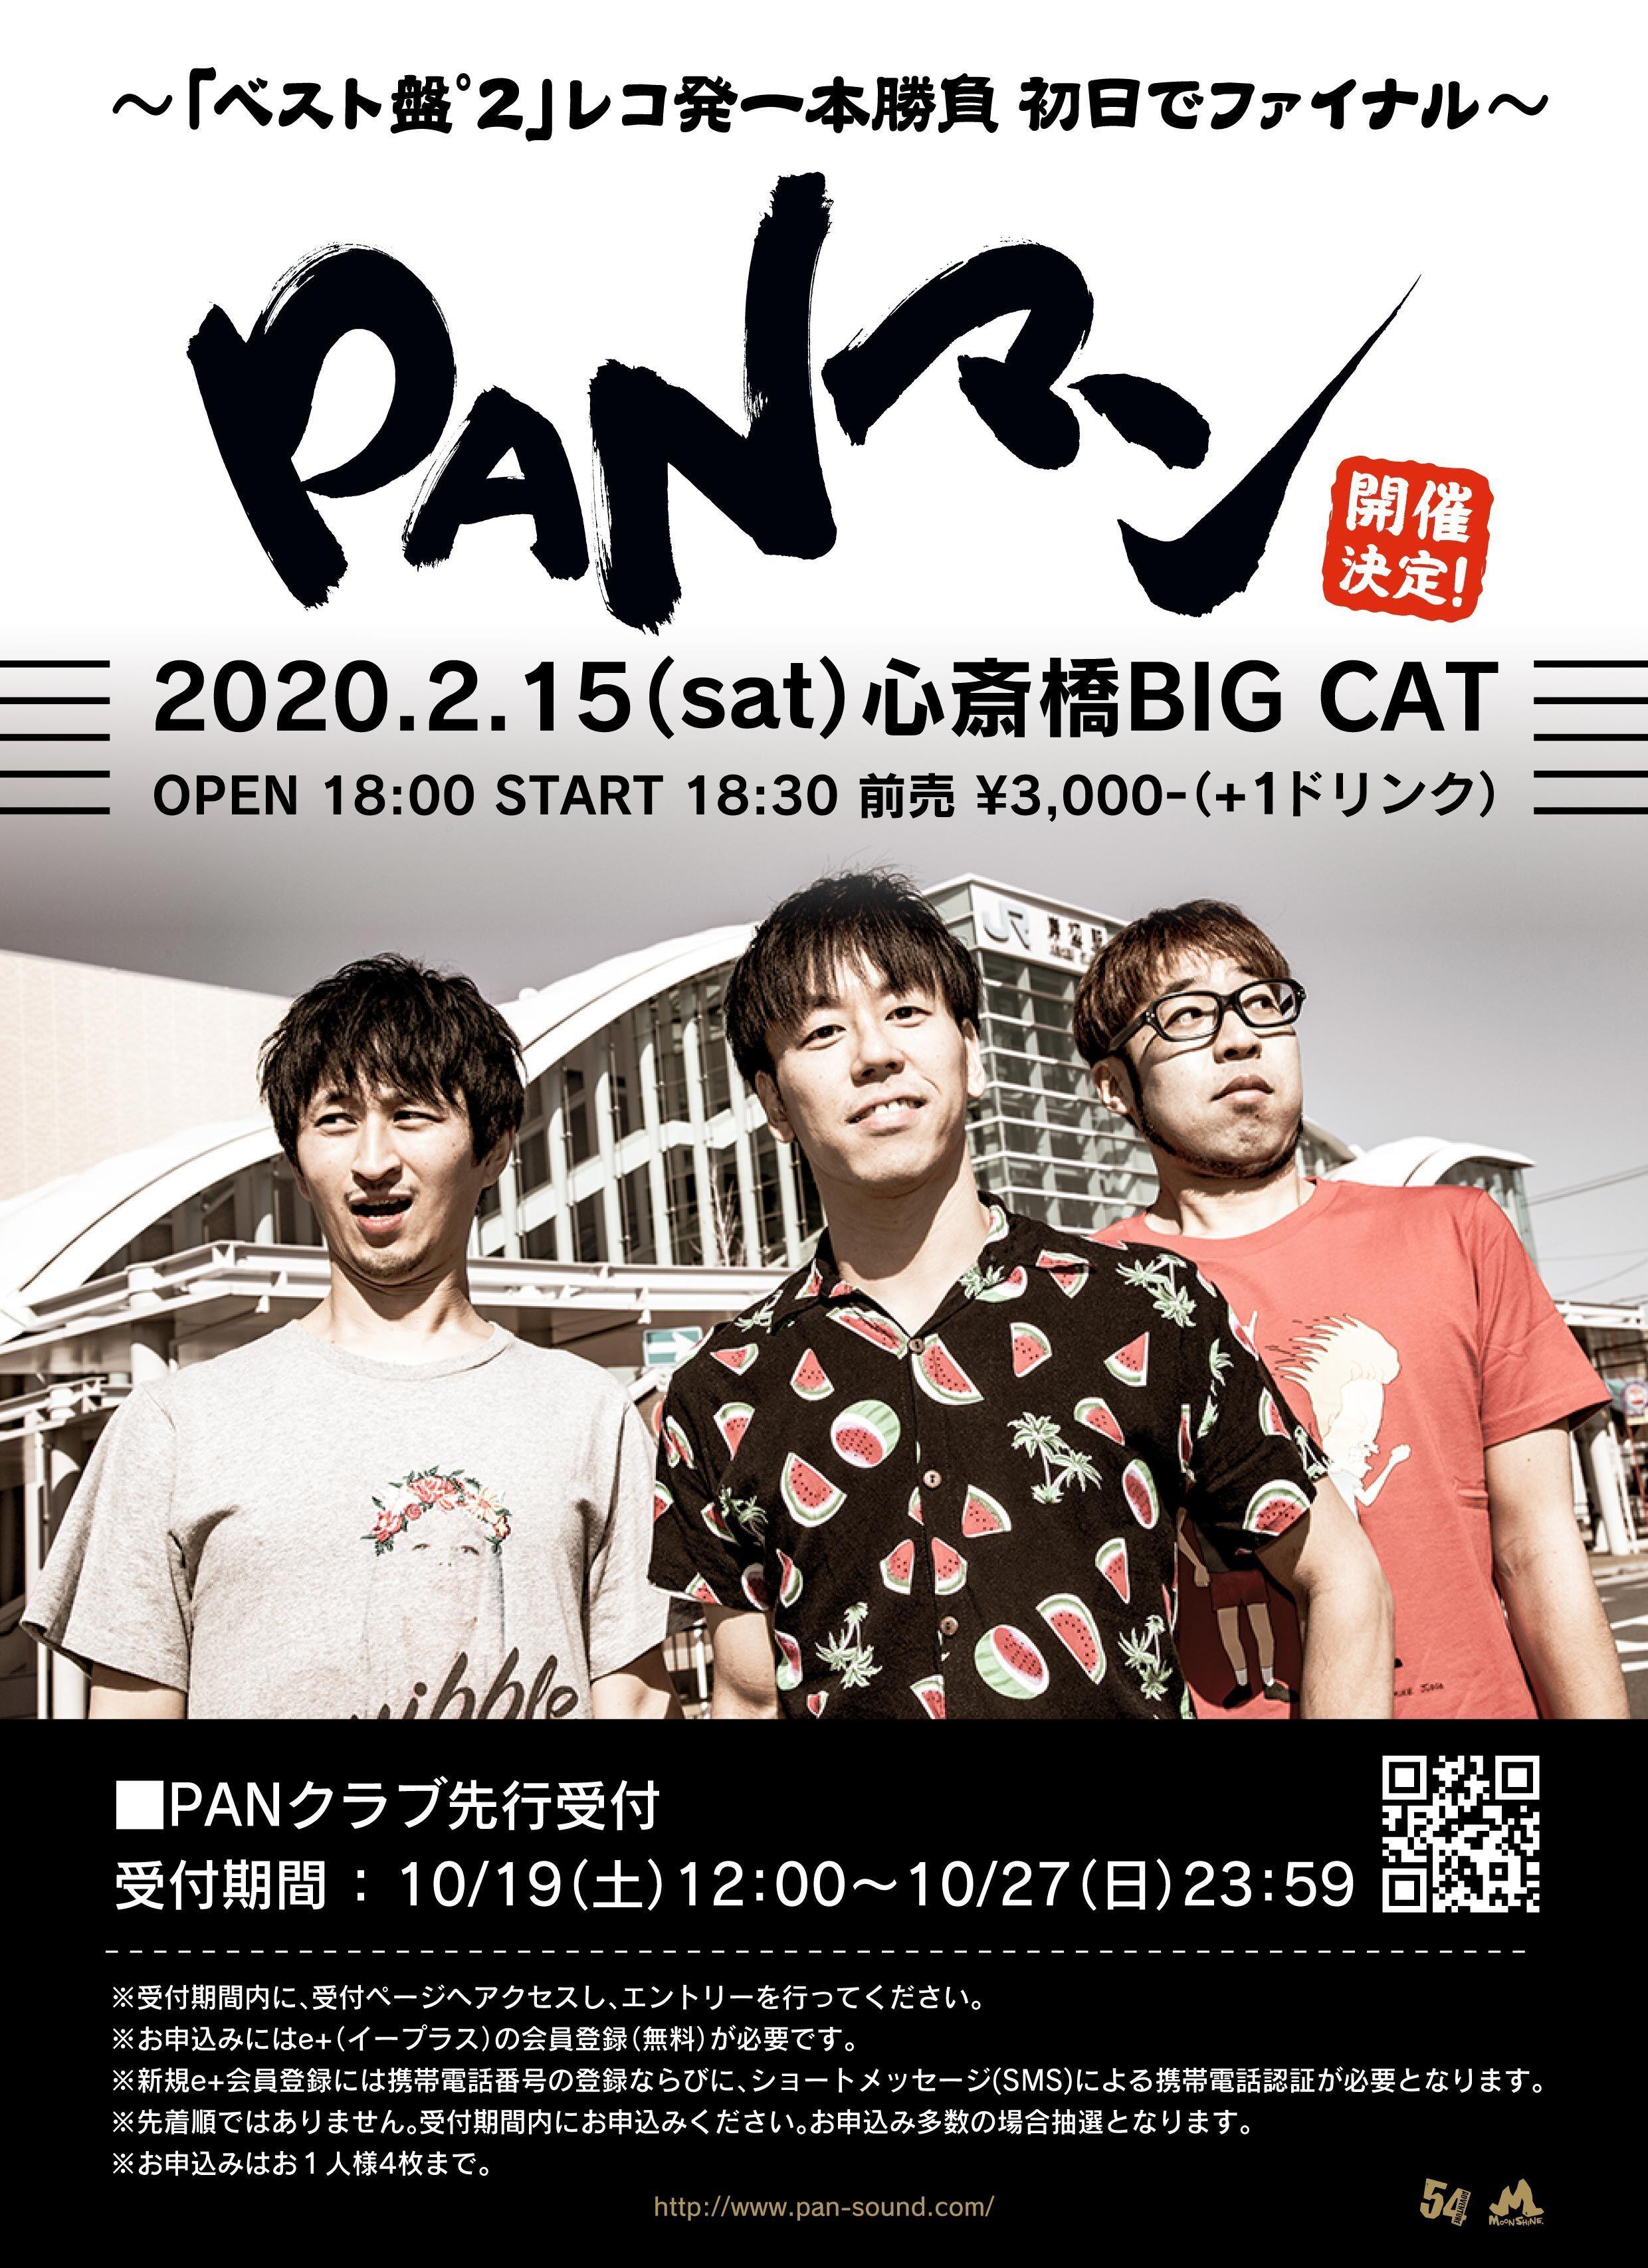 『PAN結成25周年記念「PANマン」 〜「ベスト盤°2」レコ発一本勝負 初日でファイナル〜』